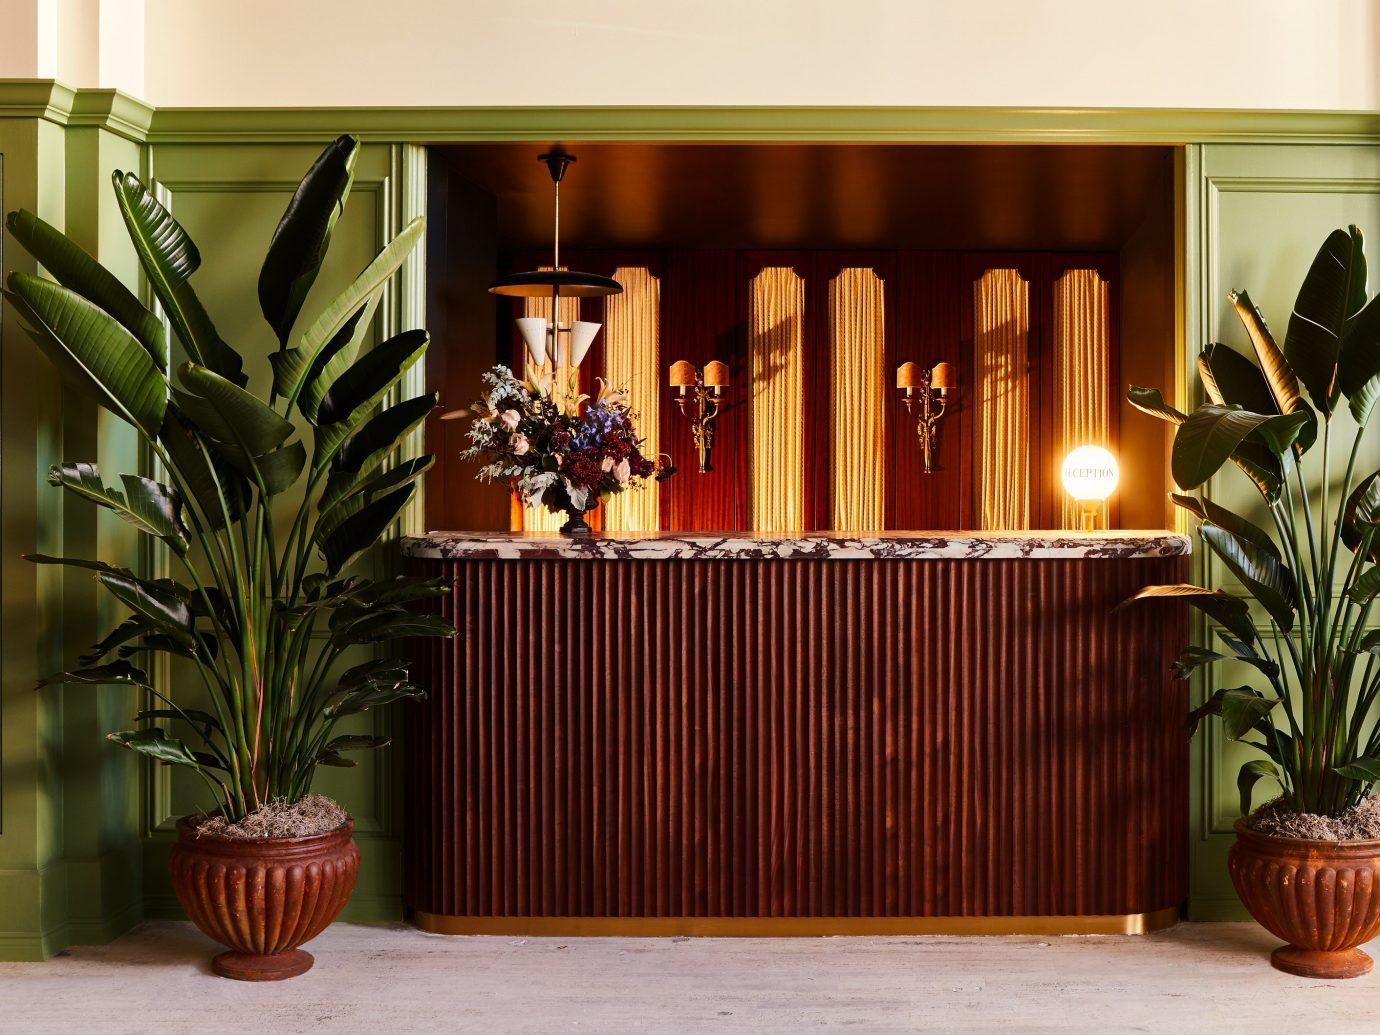 Detroit Influencers + Tastemakers Trip Ideas furniture interior design flooring floristry hardwood